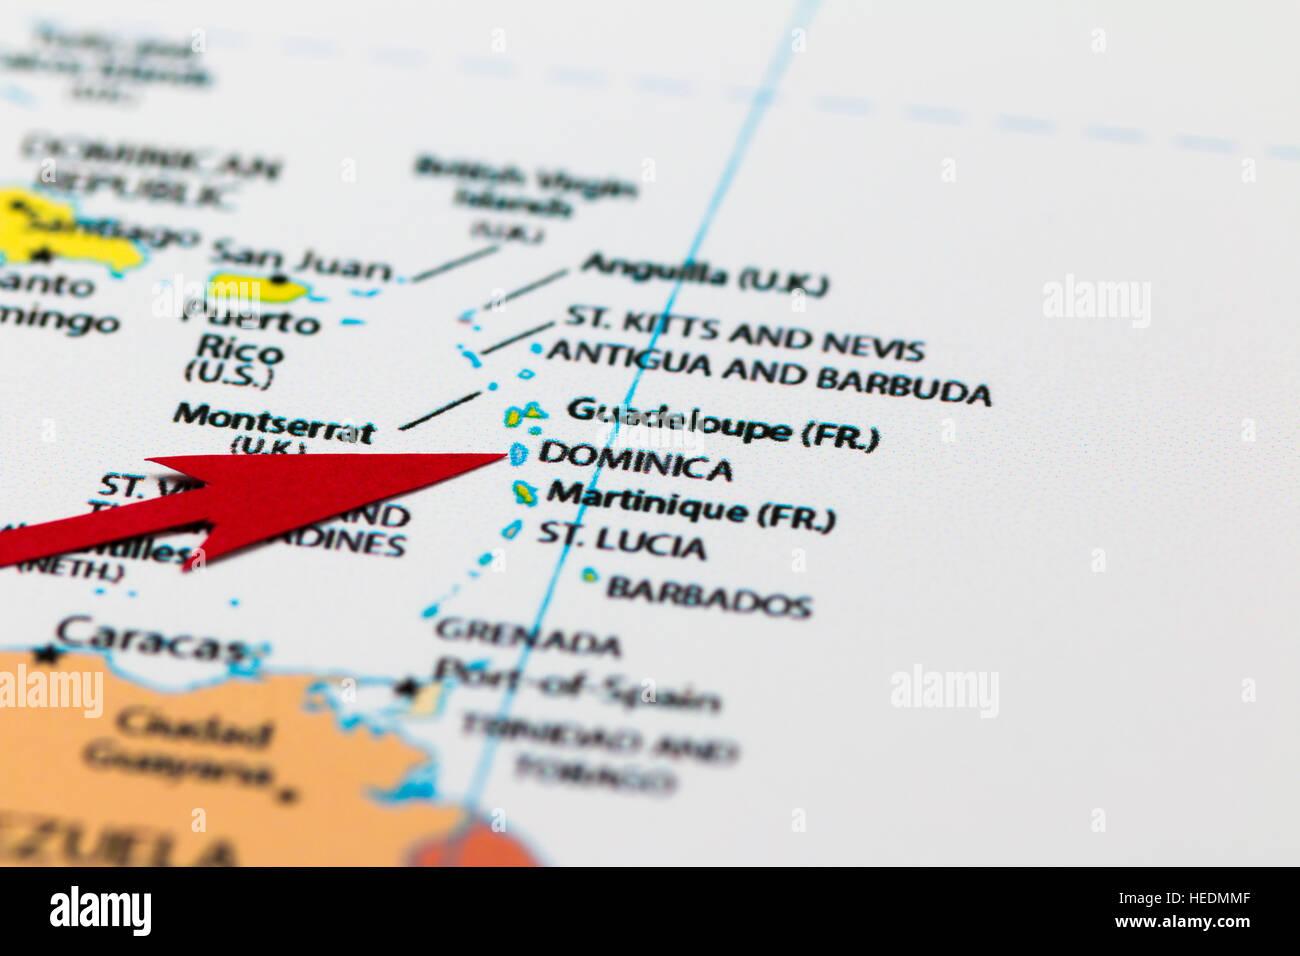 Dominica Print Map Stock Photos & Dominica Print Map Stock